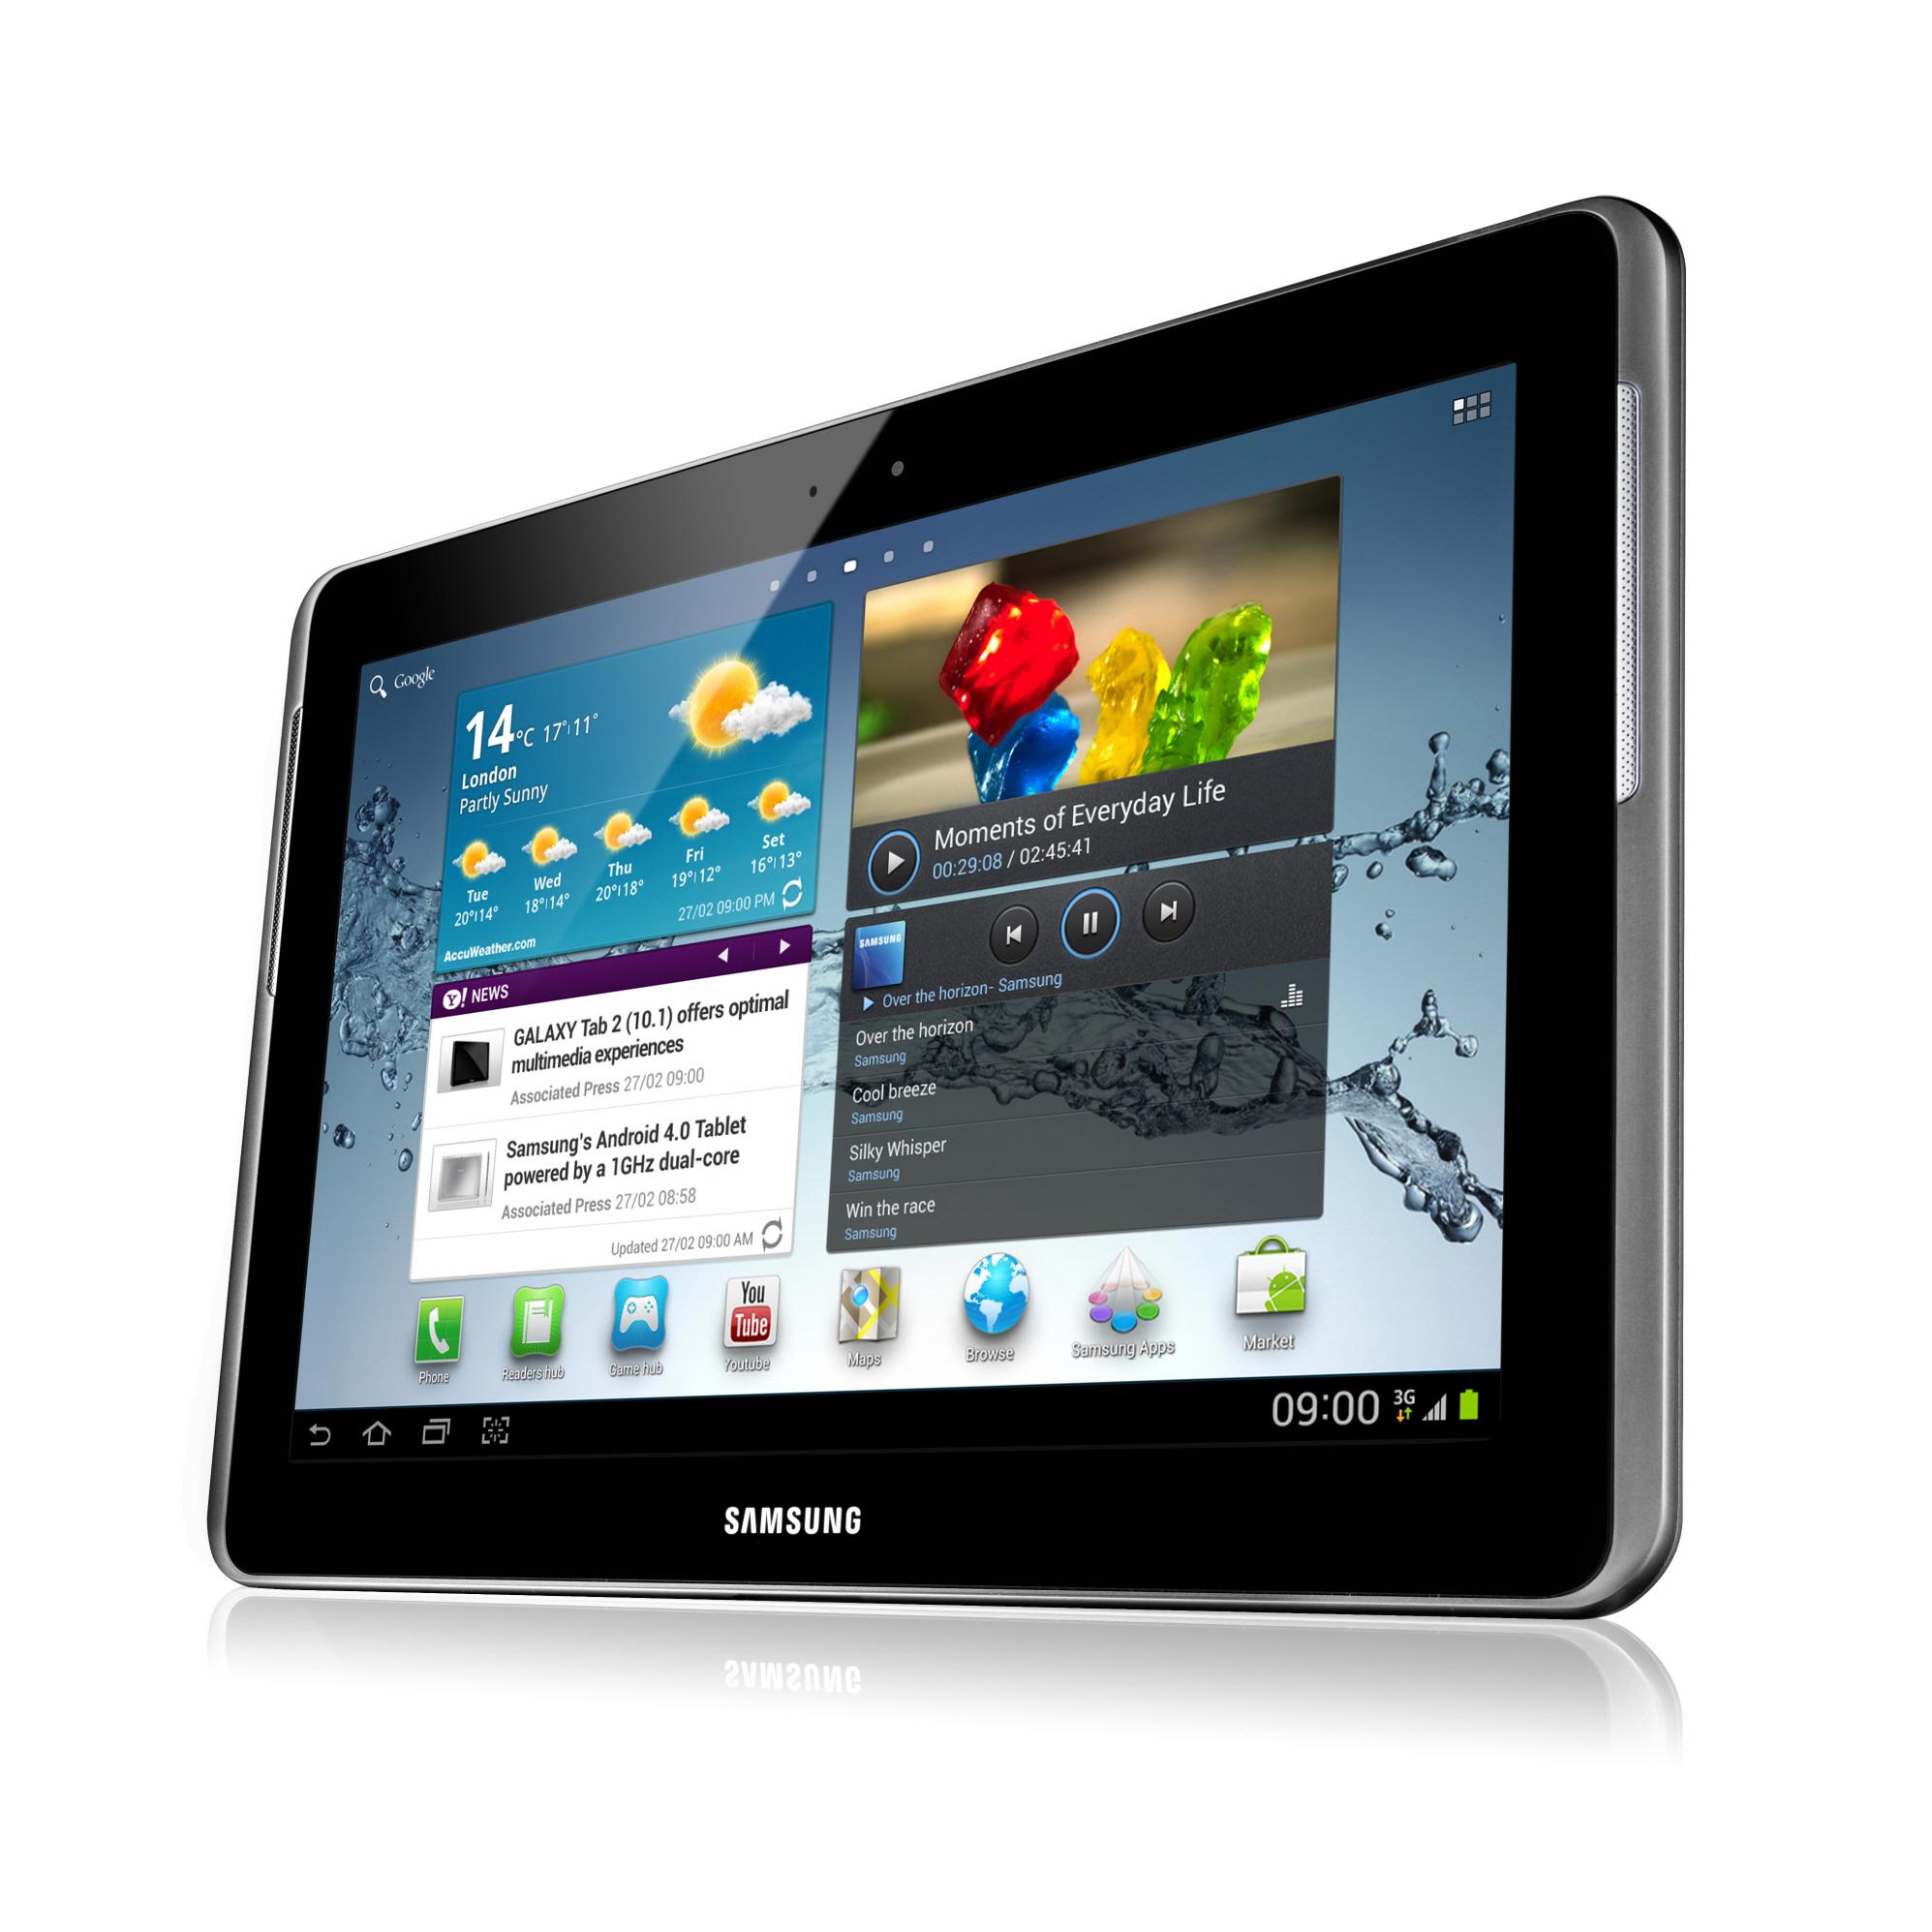 Tablet Samsung Galaxy Tab 2 10.1 w nowym wariancie z modemem LTE